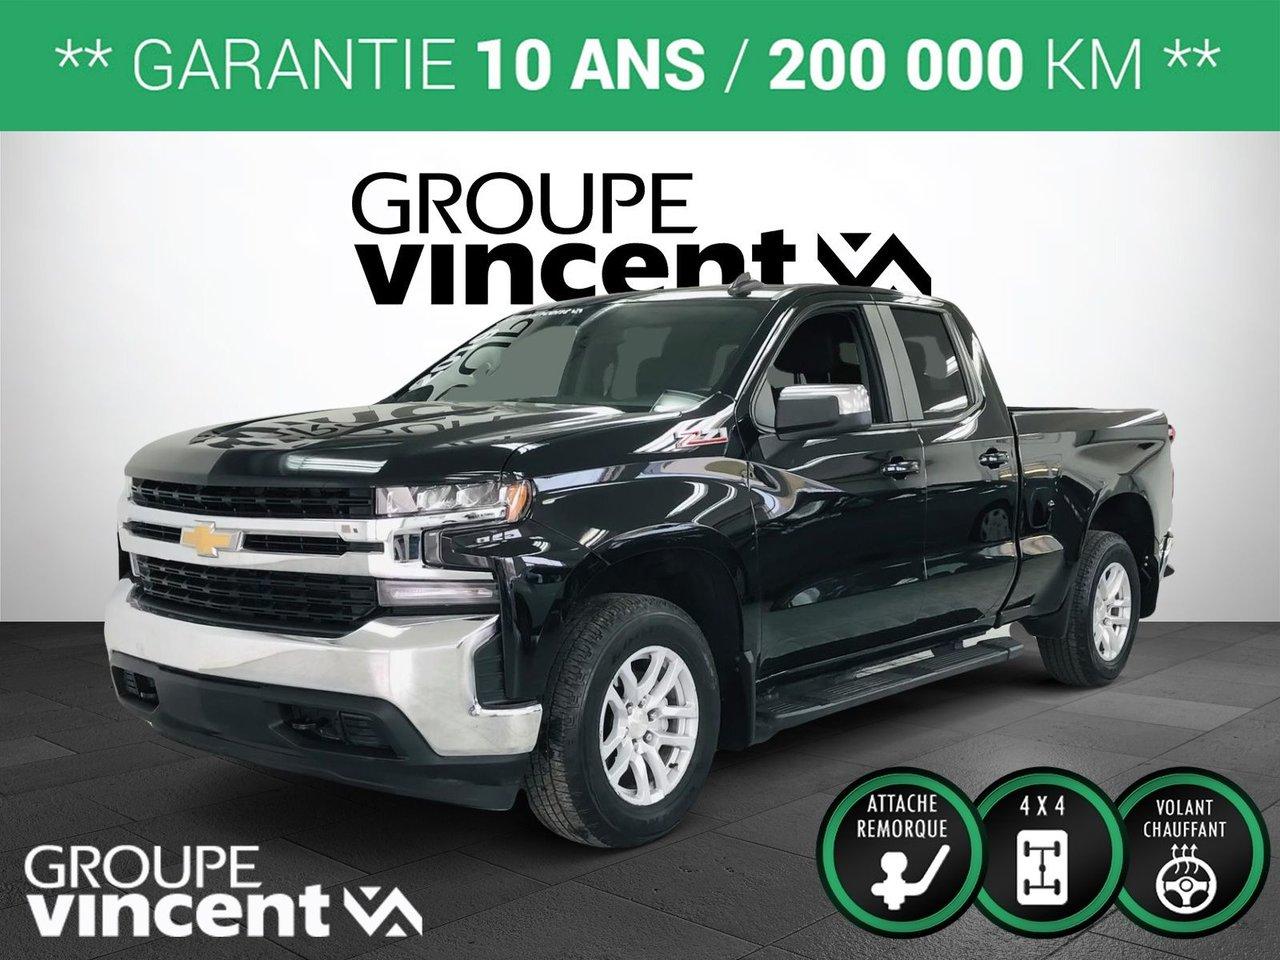 Chevrolet Silverado 1500 2019 LT Z71 4X4 ** GARANTIE 10 ANS **